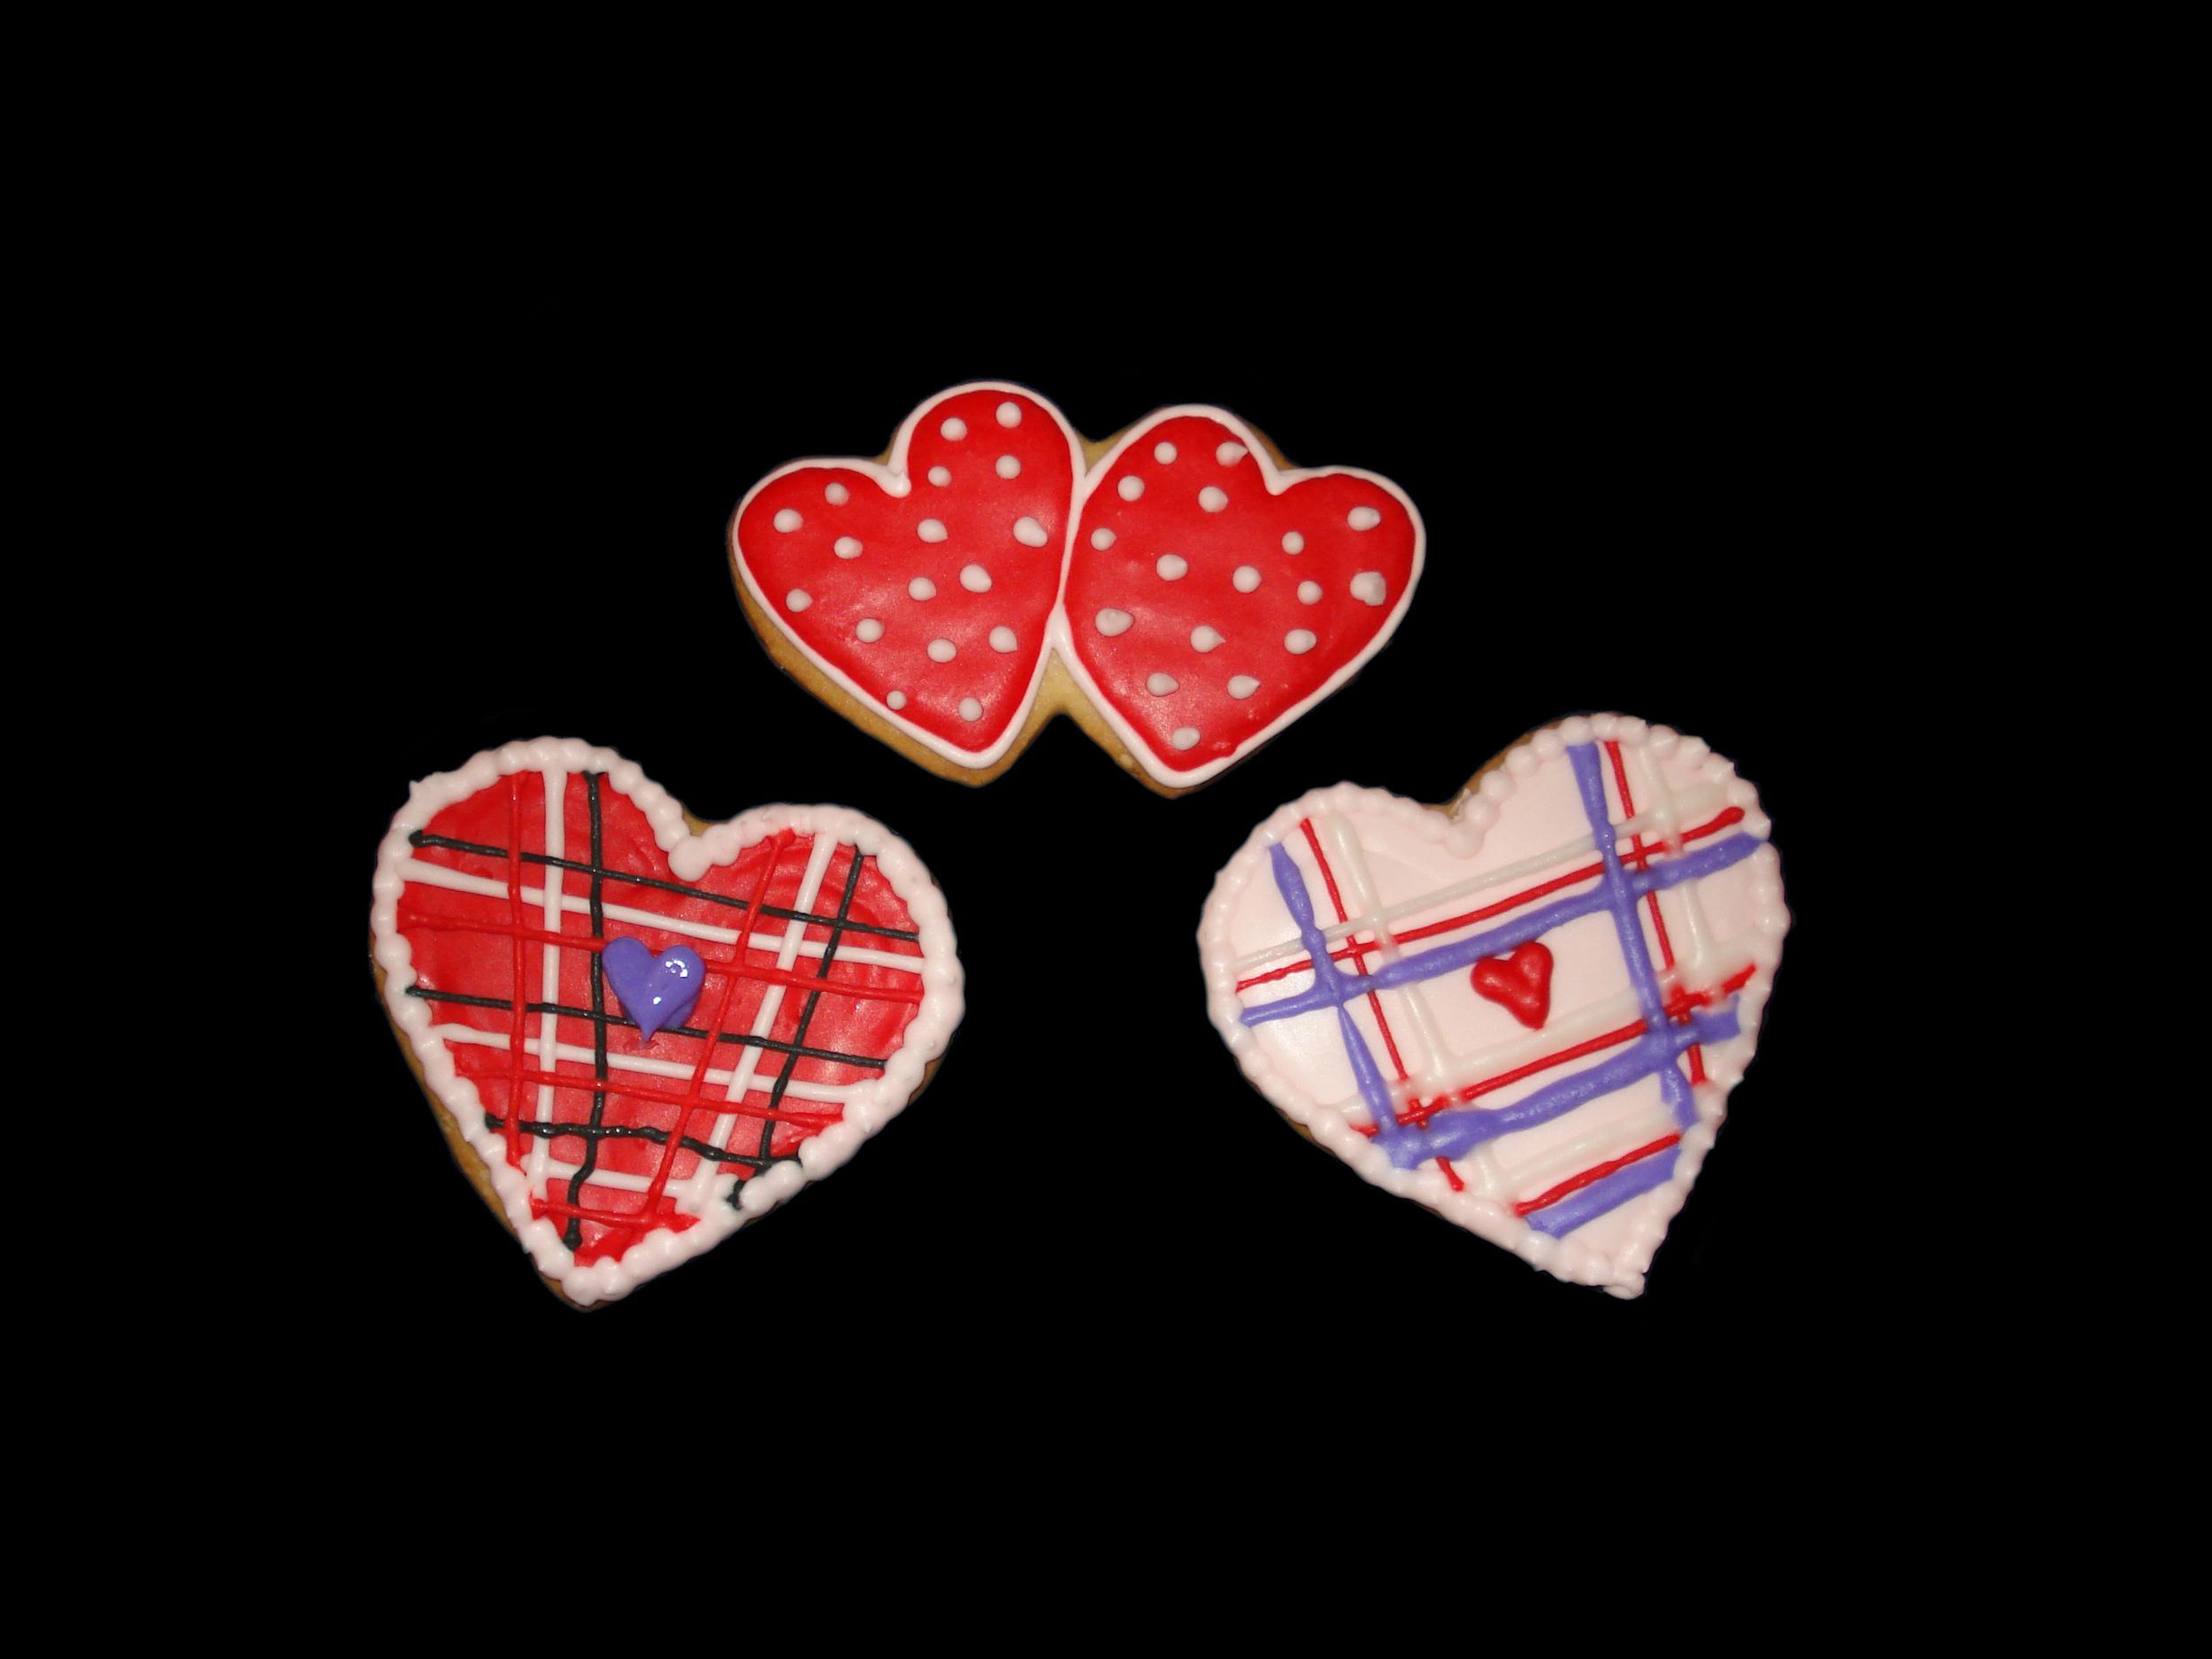 xCookie Plaid Hearts.jpg